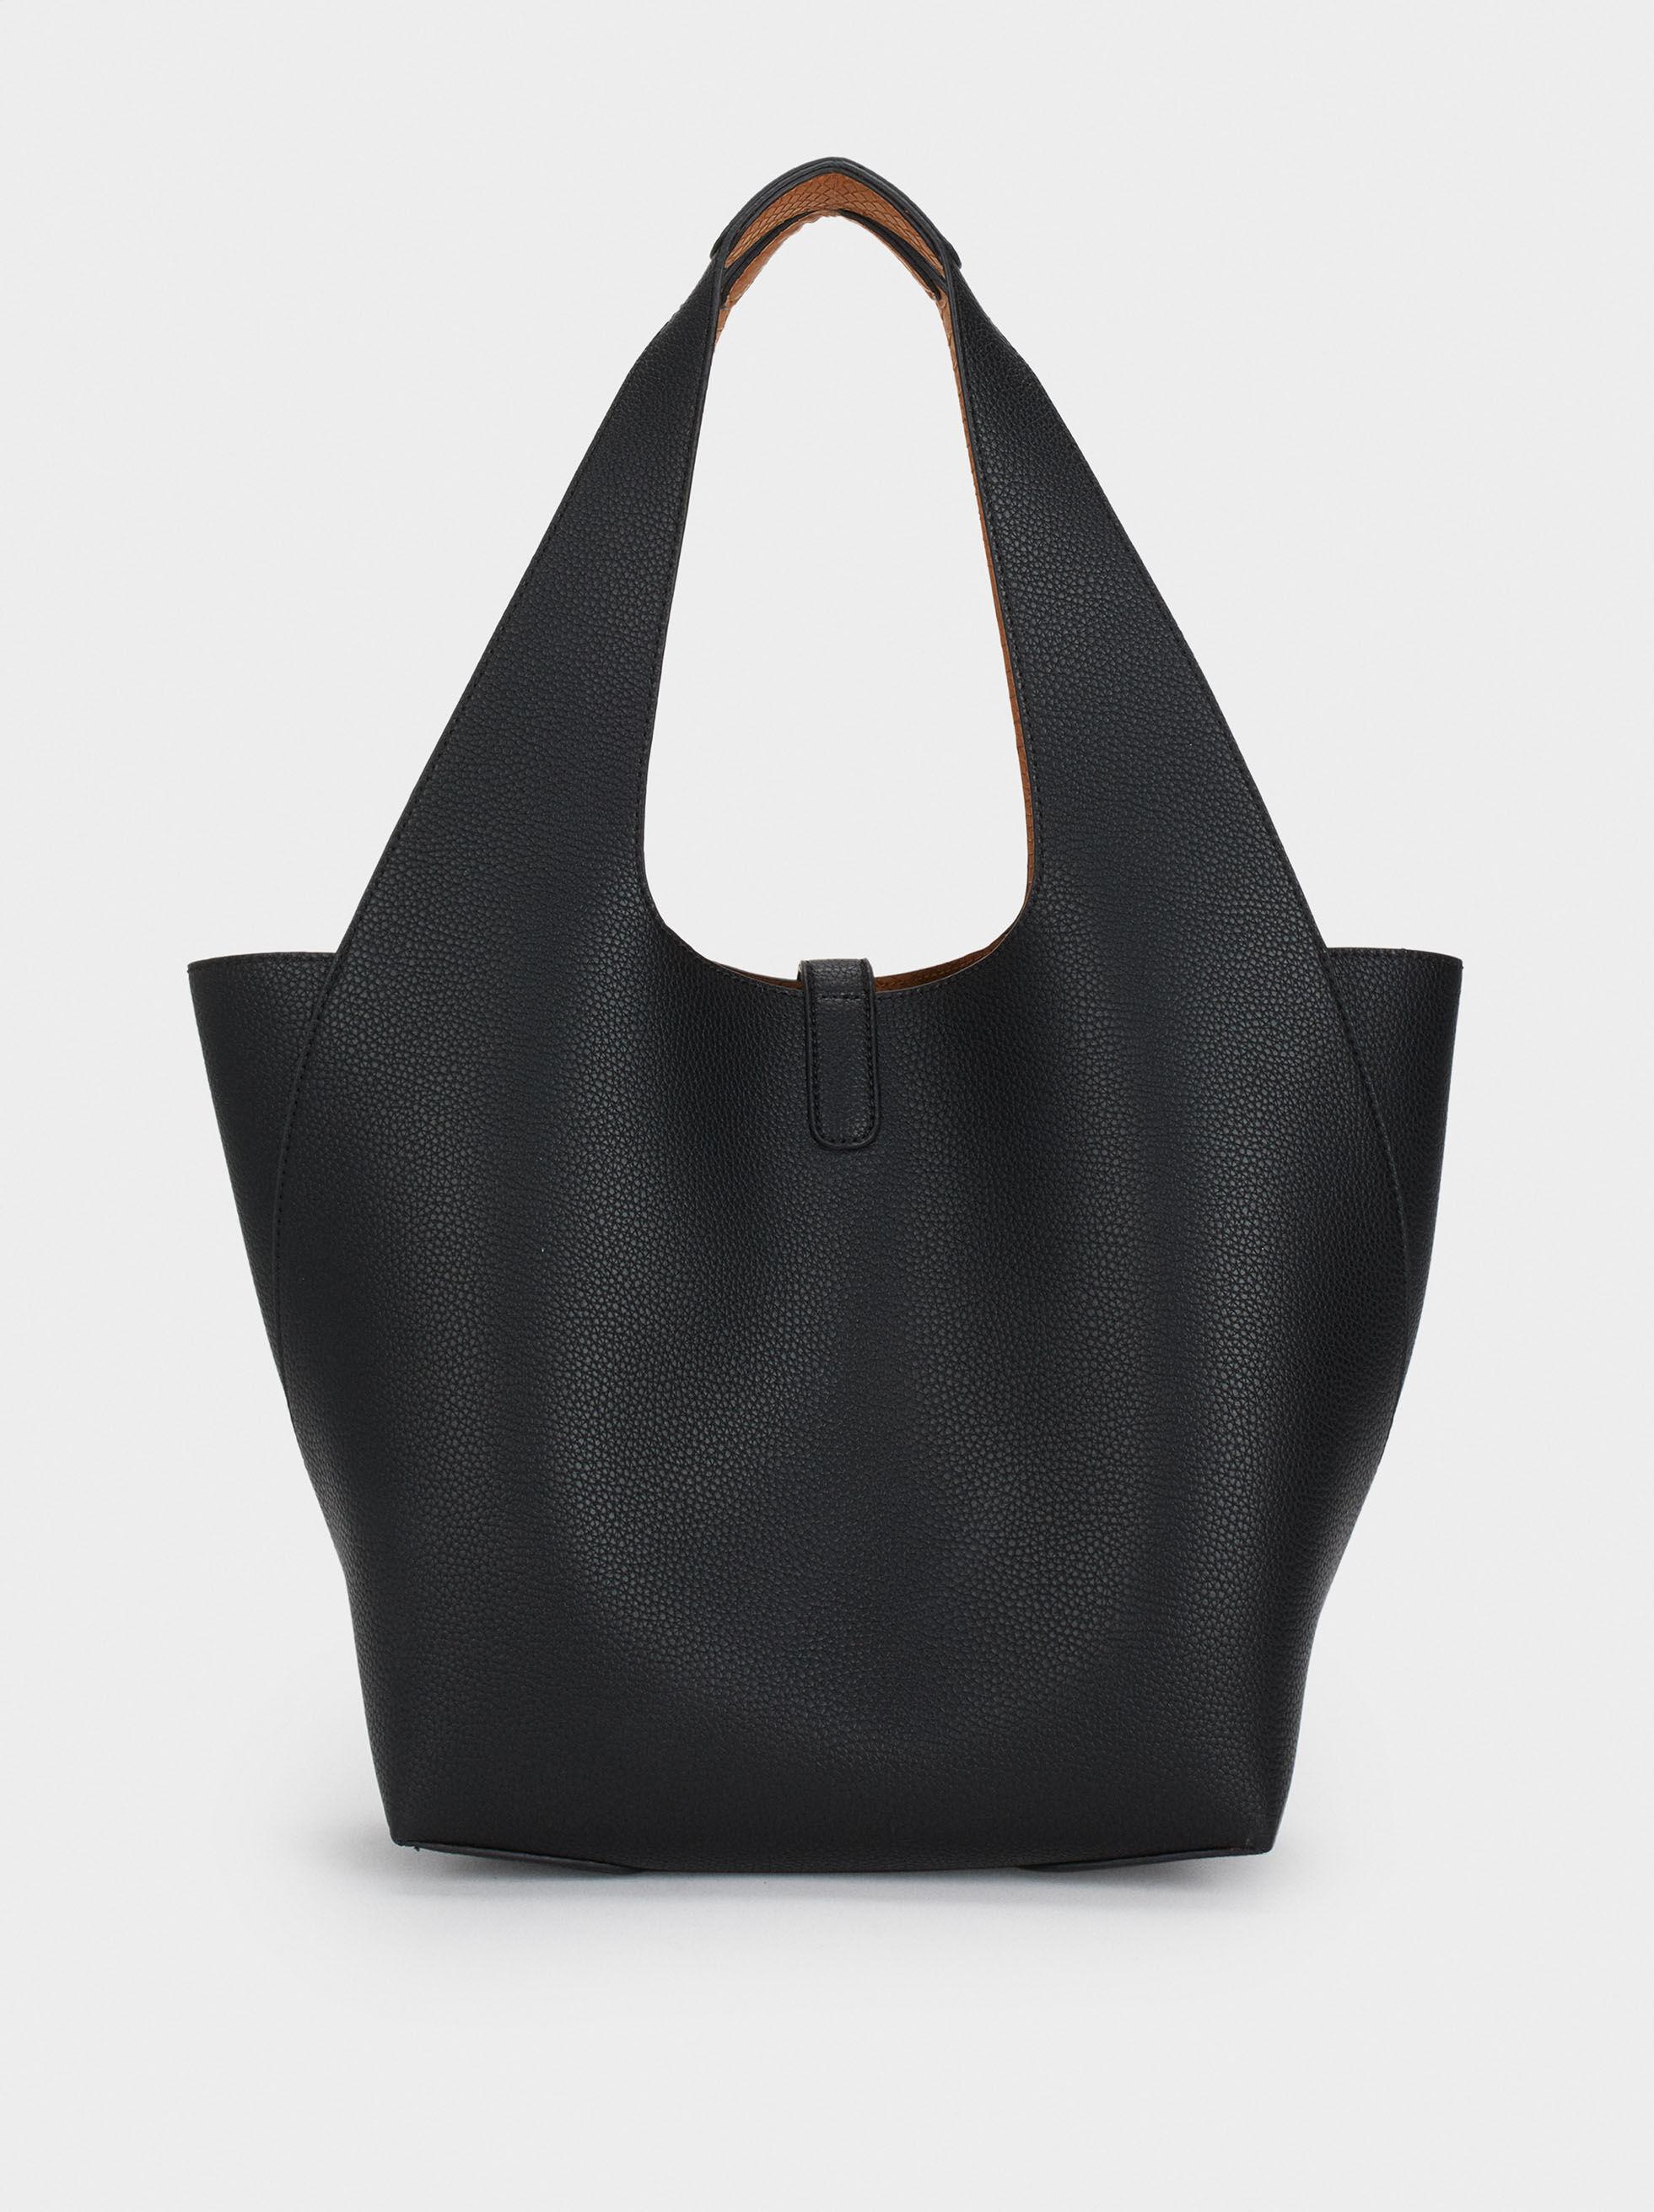 Reversible Handbag, Black, hi-res